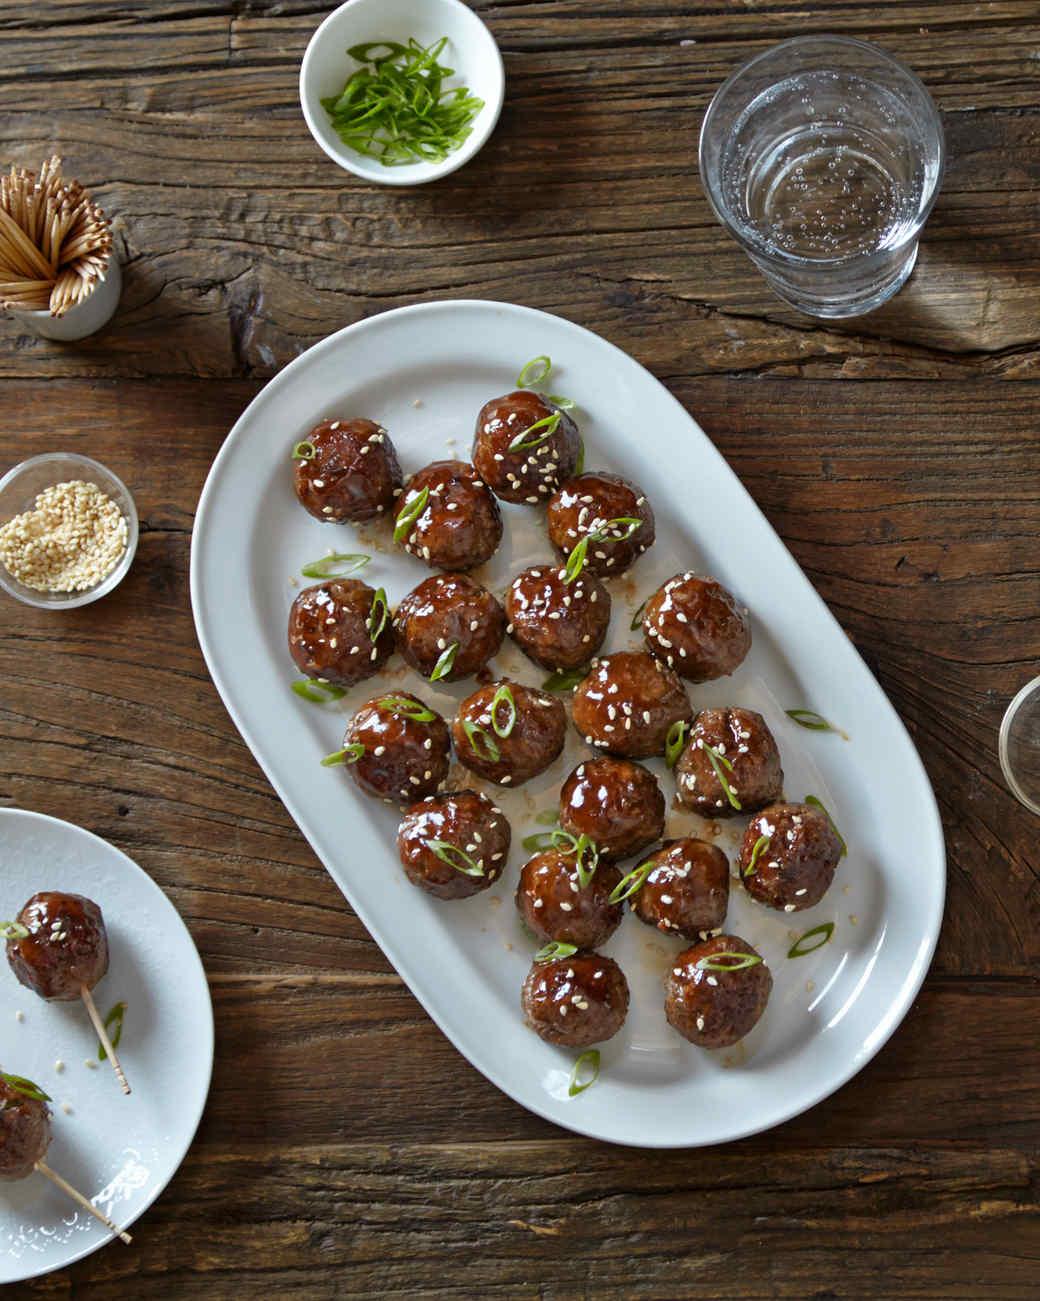 Sunday brunch recipes meatballs appetizer